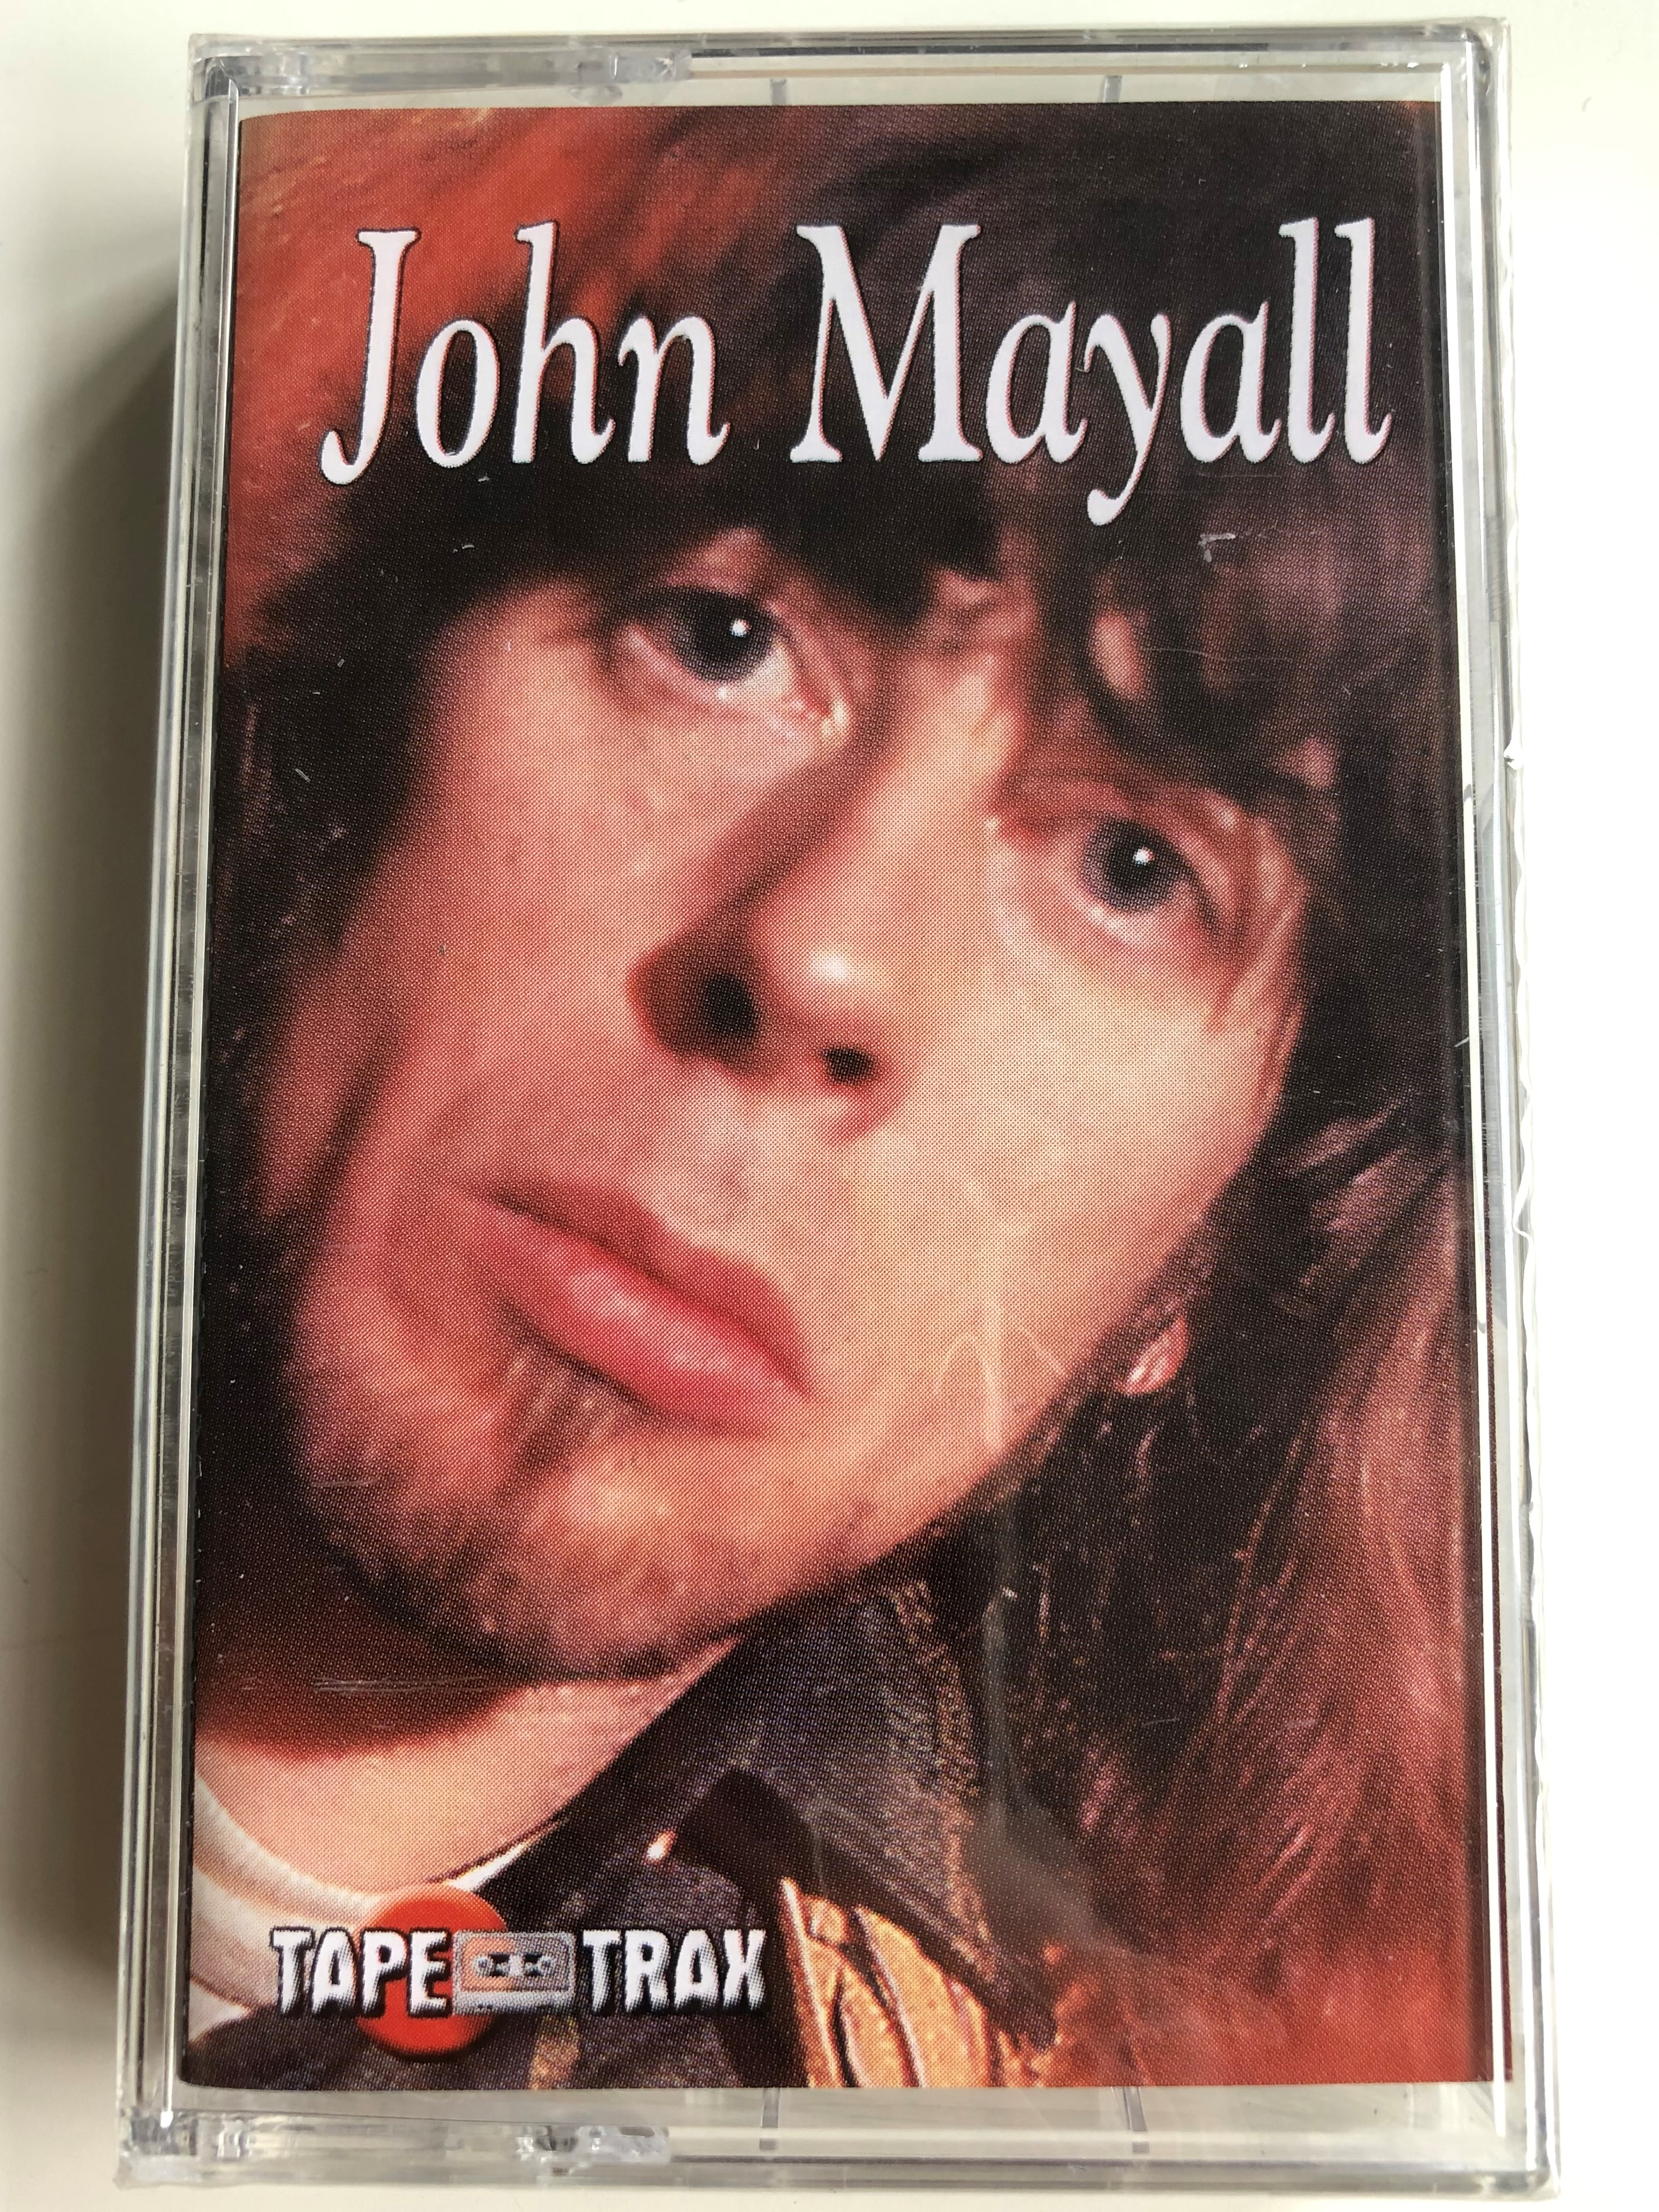 john-mayall-tape-trax-audio-cassette-tt20185-1-.jpg